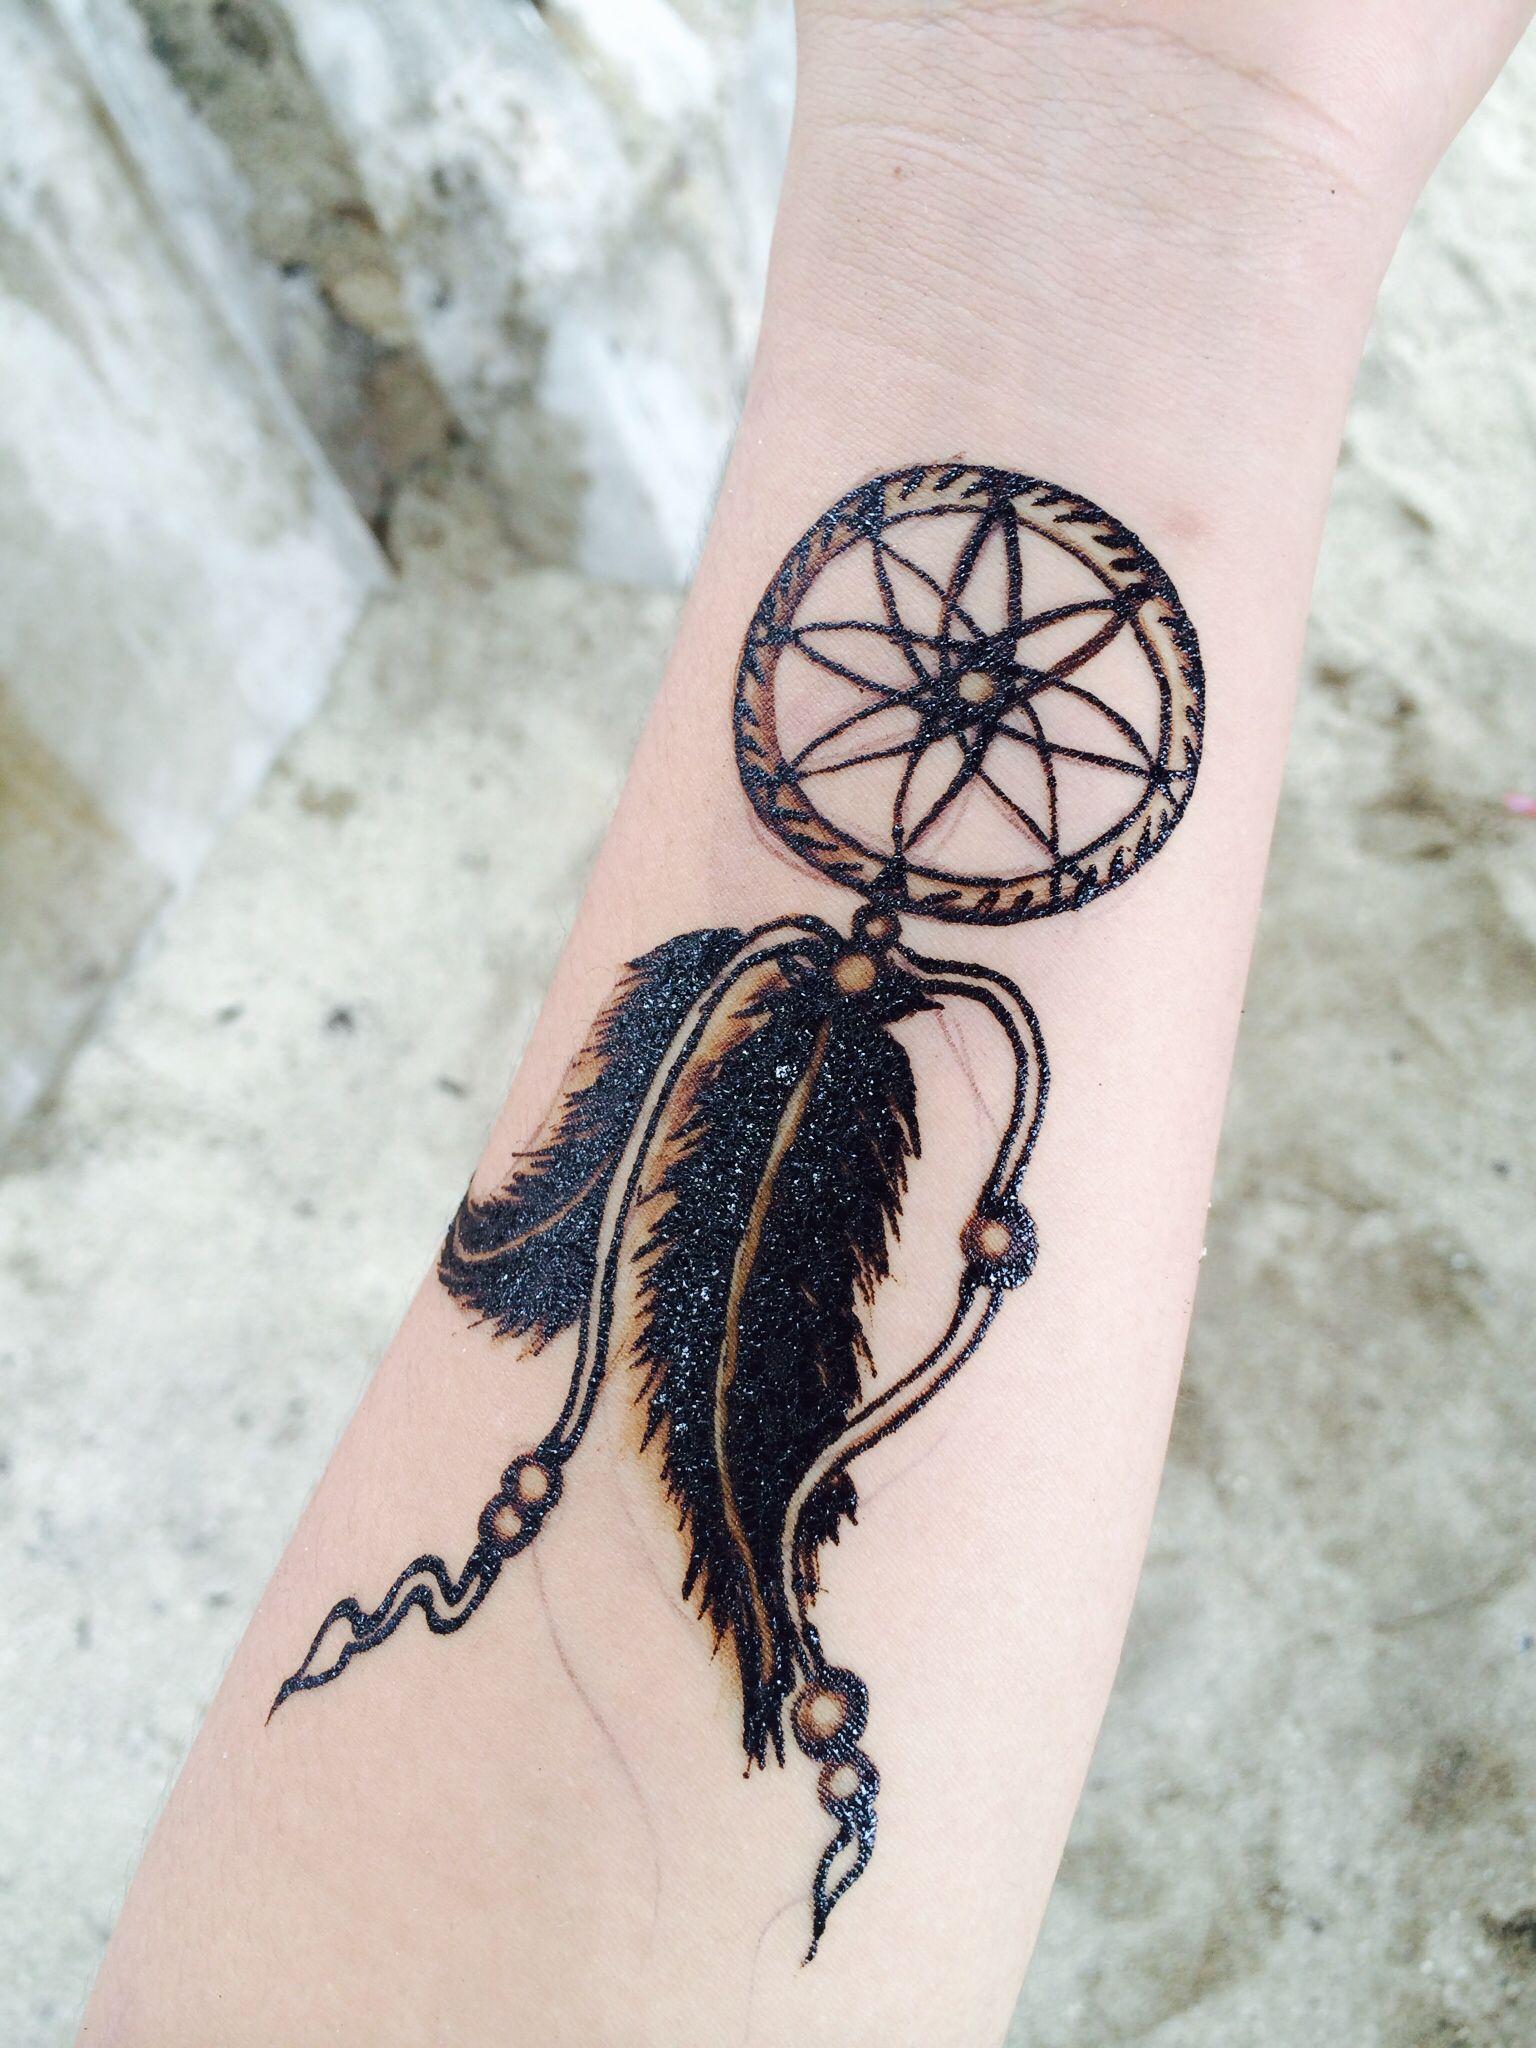 Henna tattoo charleston sc - My dream catcher henna tattoo